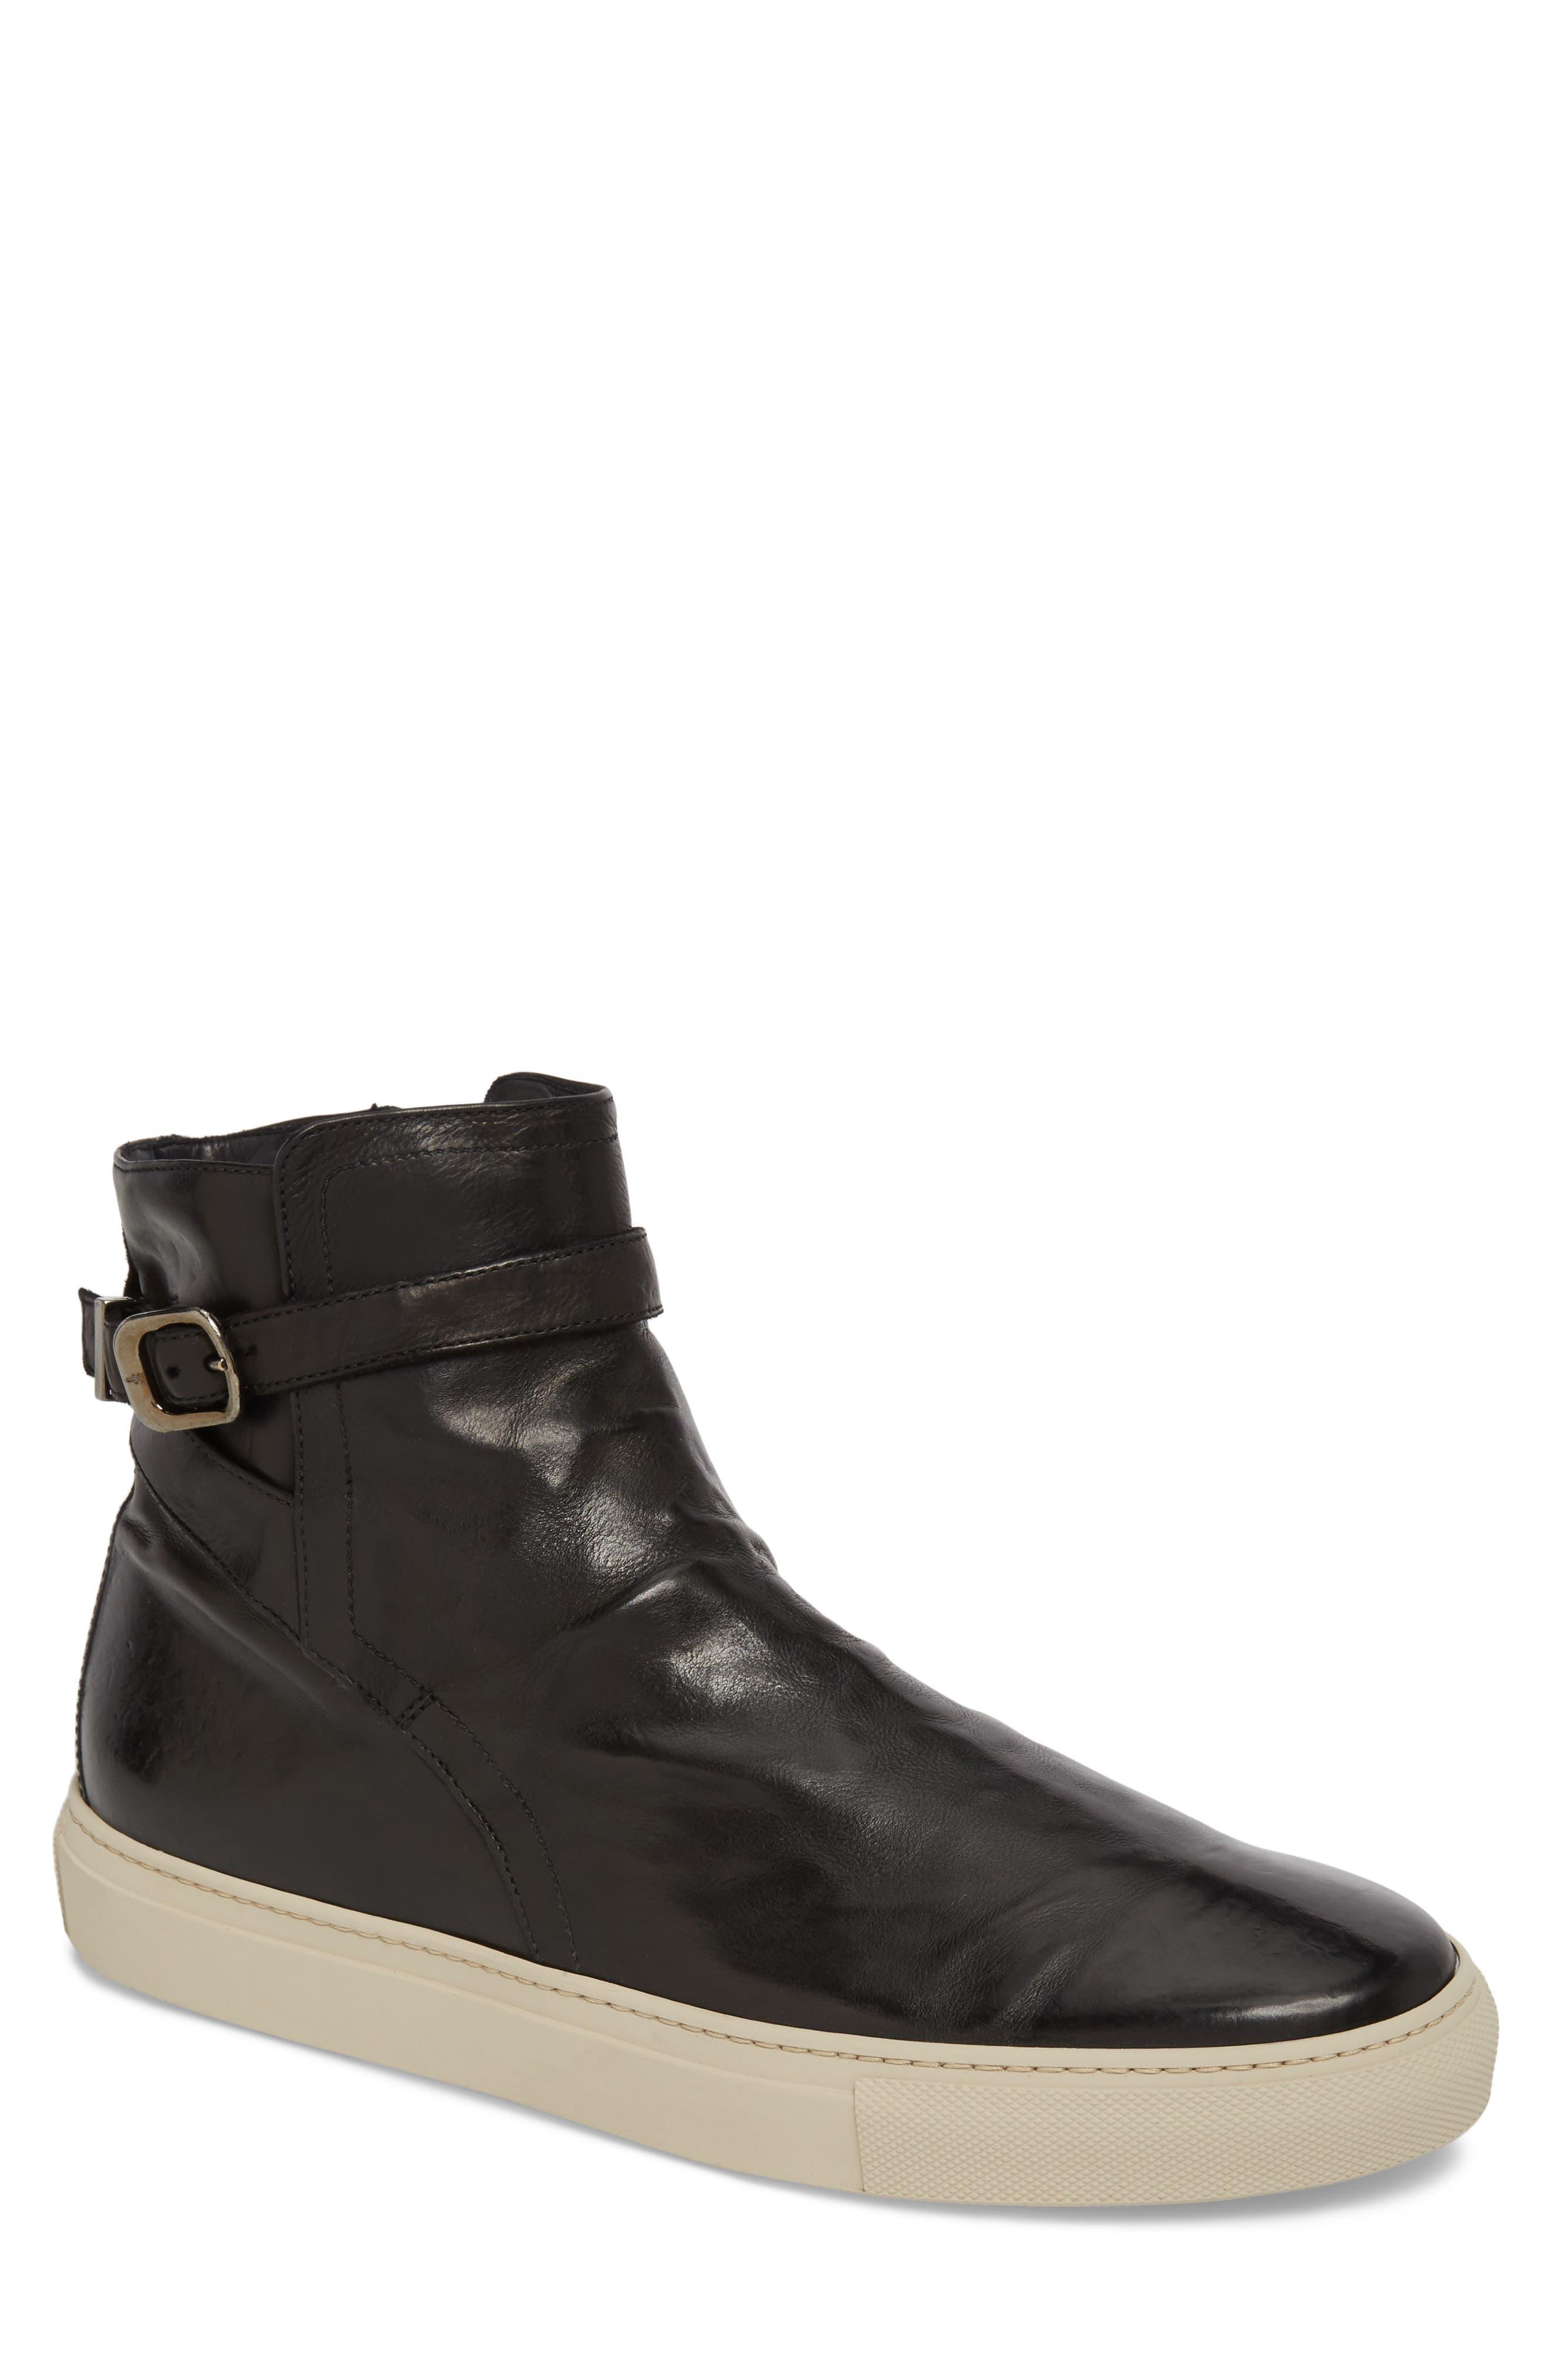 Owen Jodhpur High Top Sneaker,                             Main thumbnail 1, color,